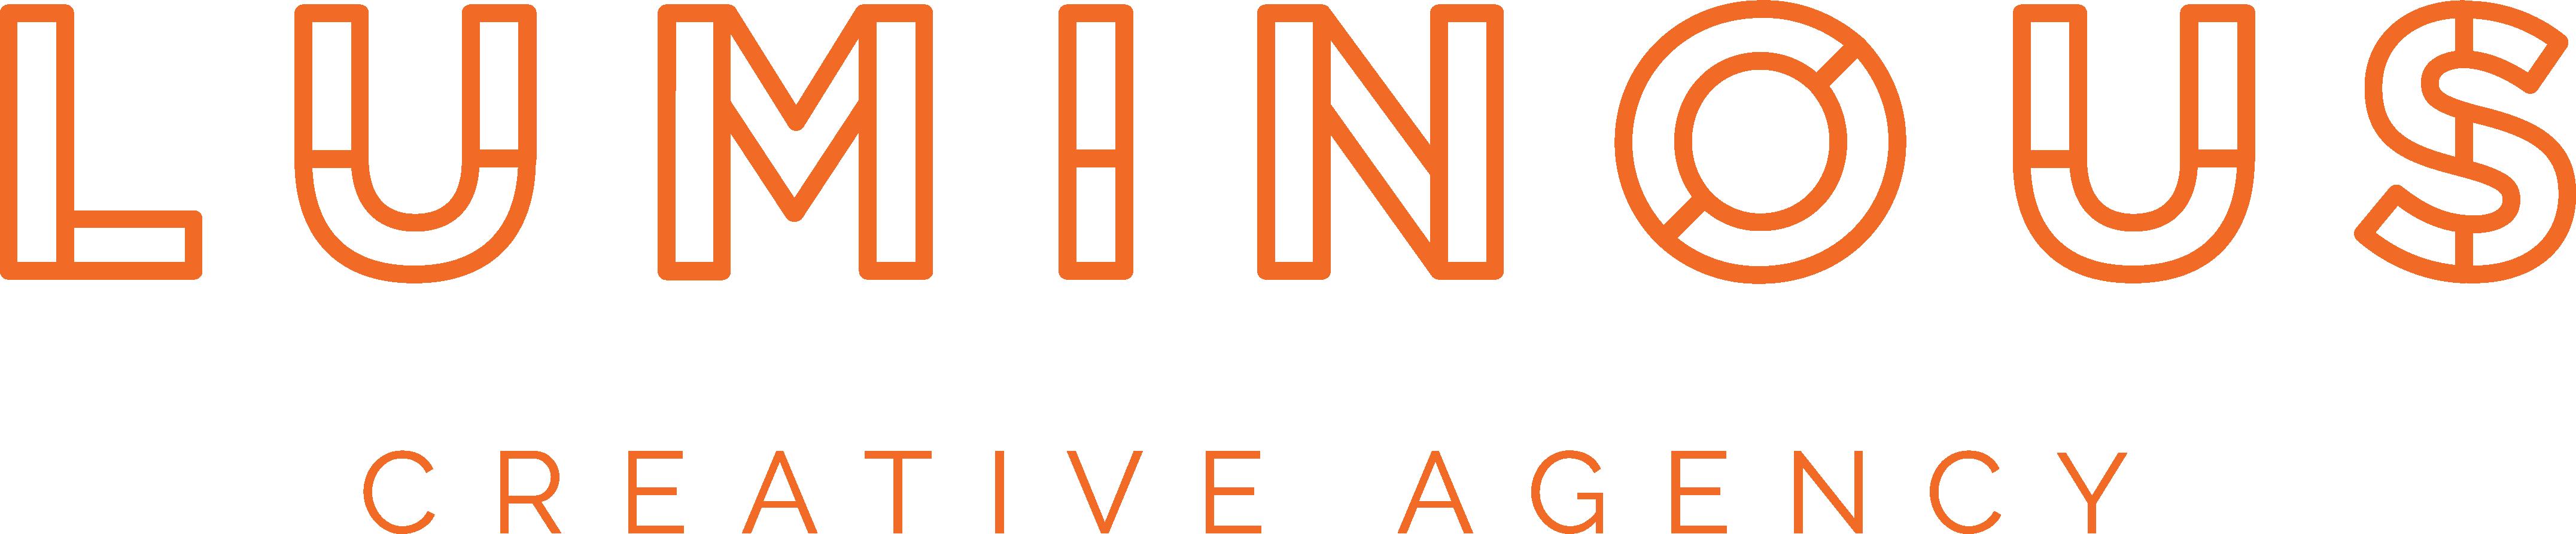 Luminous Creative Agency Logo